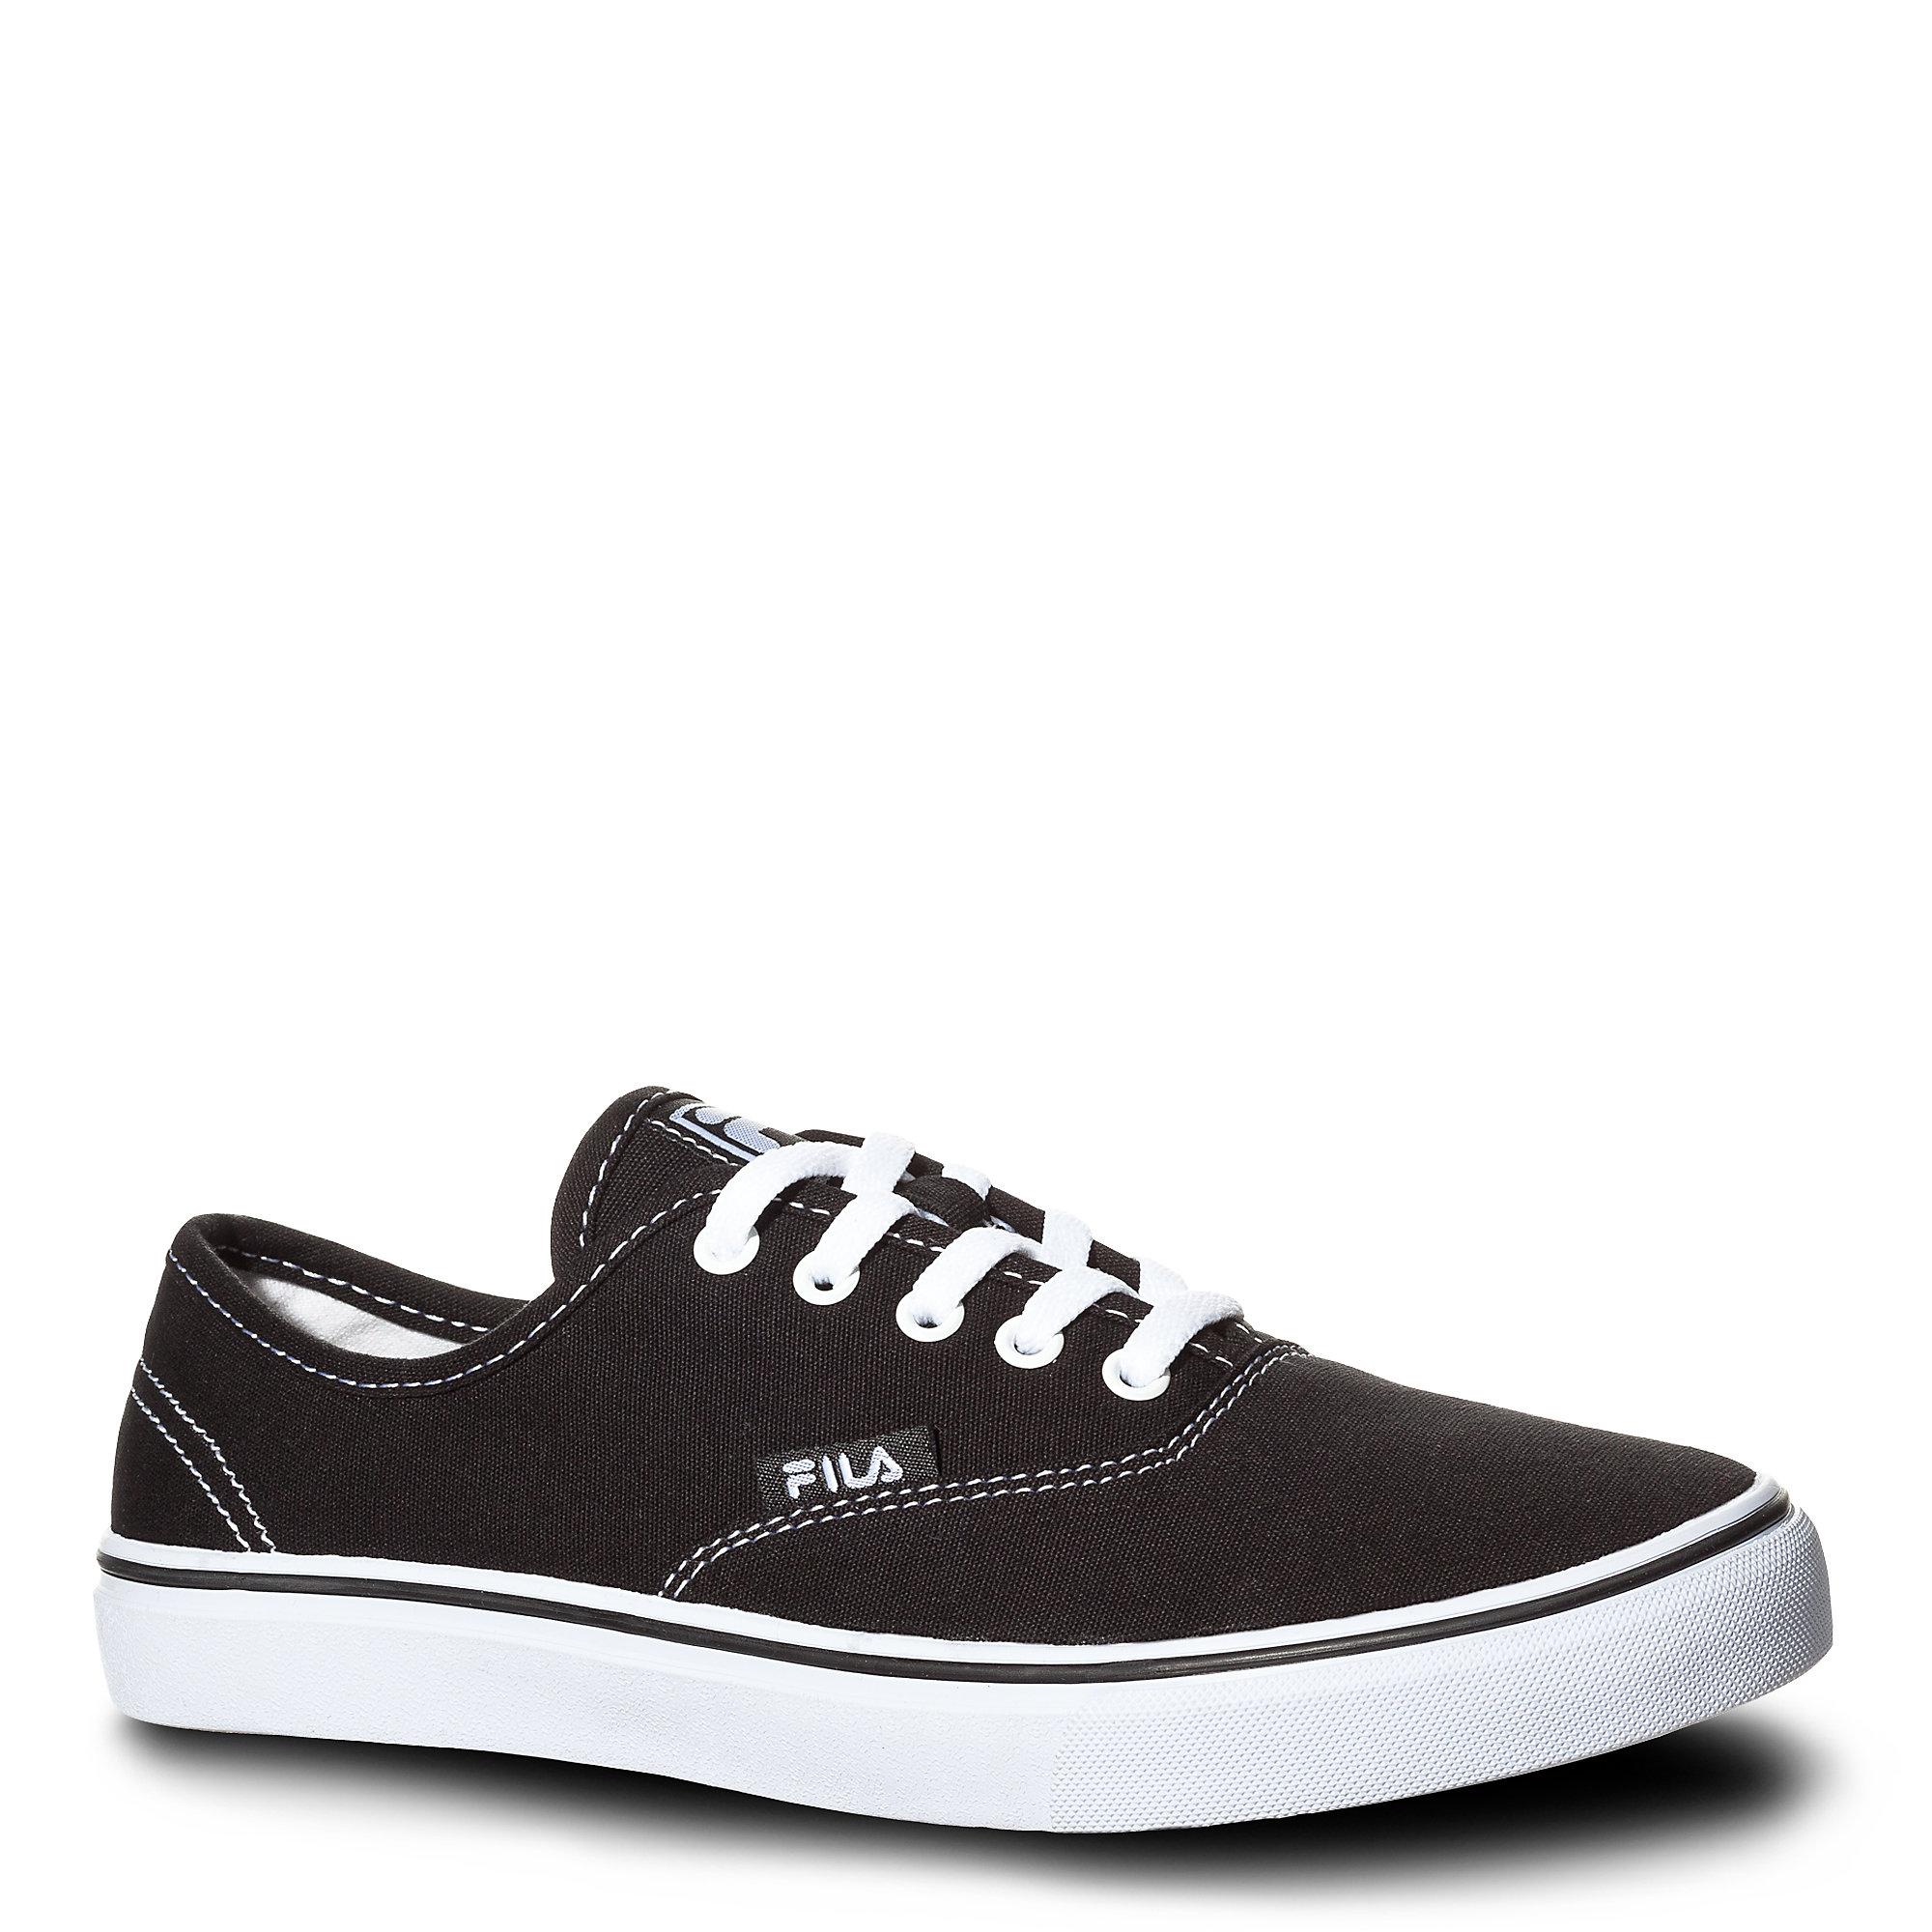 fila s classic canvas shoes ebay